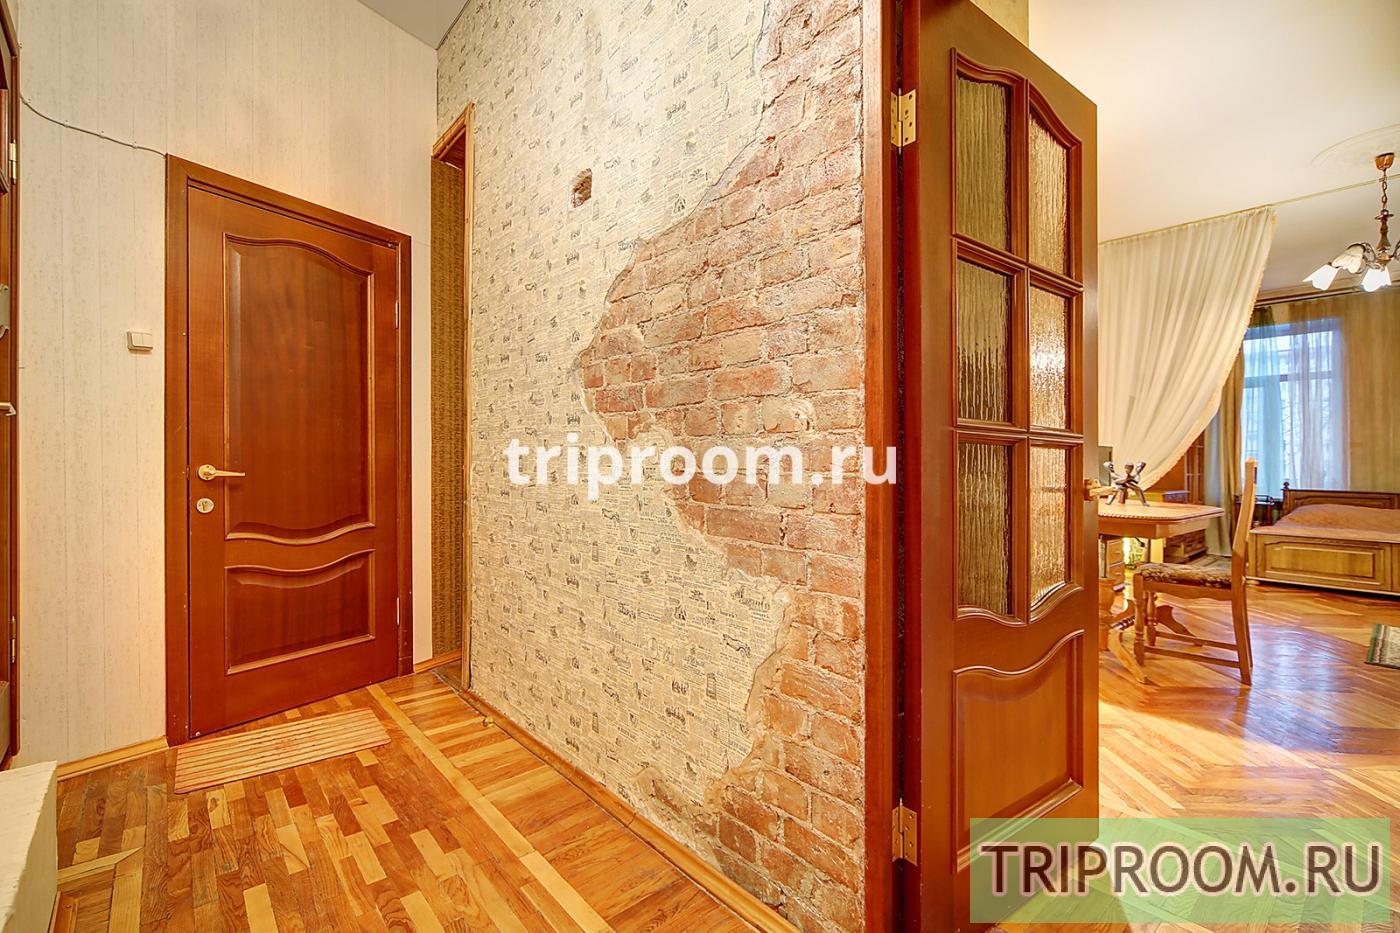 1-комнатная квартира посуточно (вариант № 15445), ул. Лиговский проспект, фото № 19